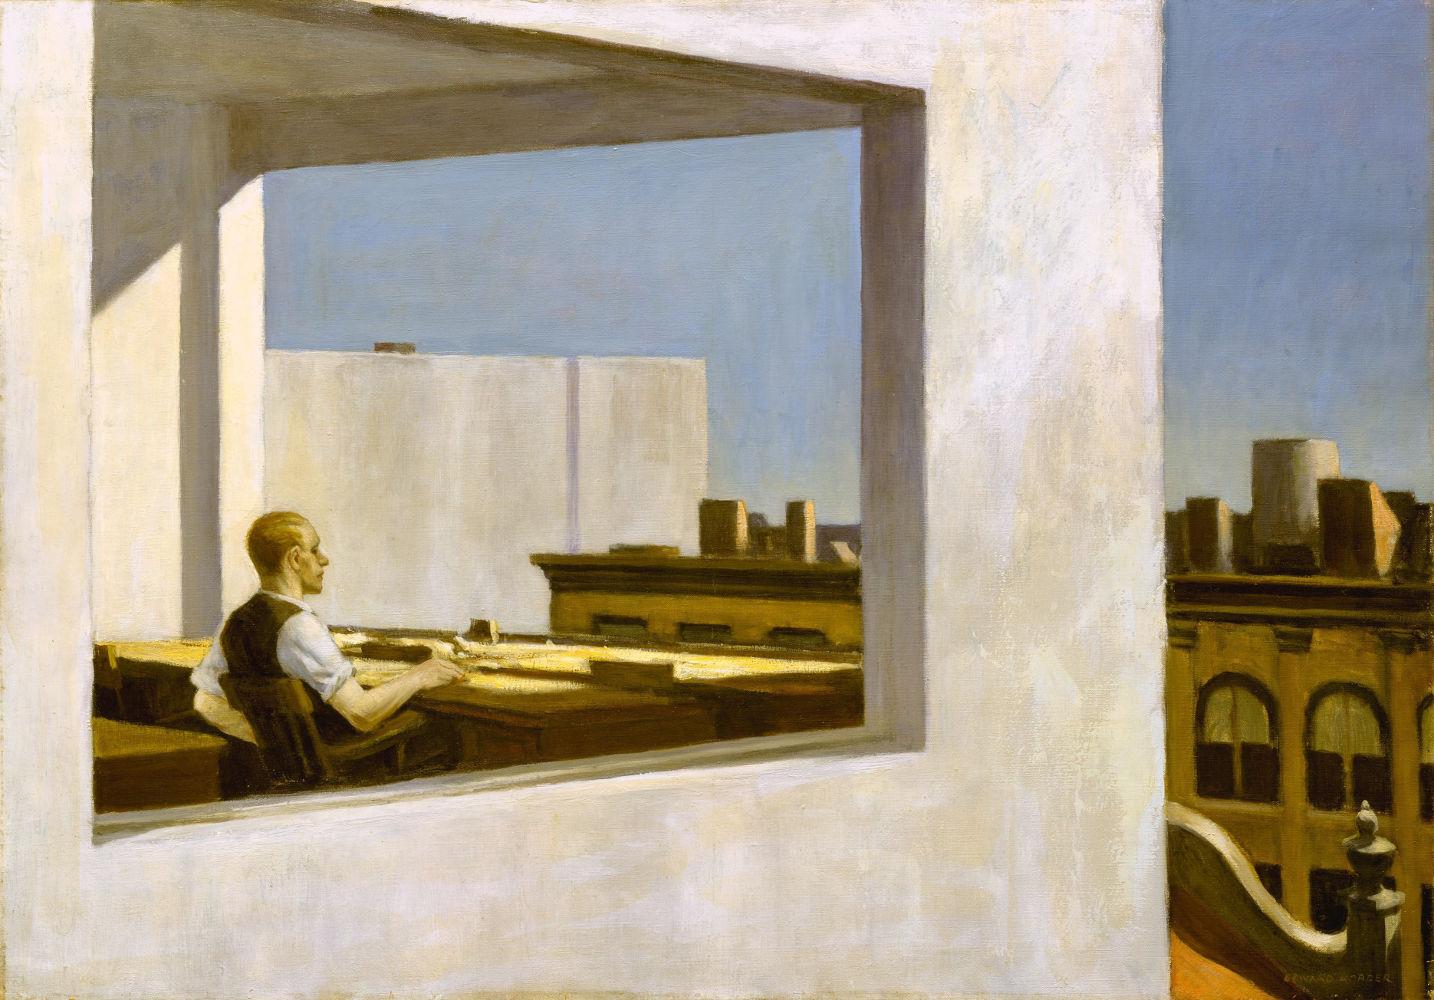 Office in a Small City (1953), Μητροπολιτικό Μουσείο της Νέας Υόρκης